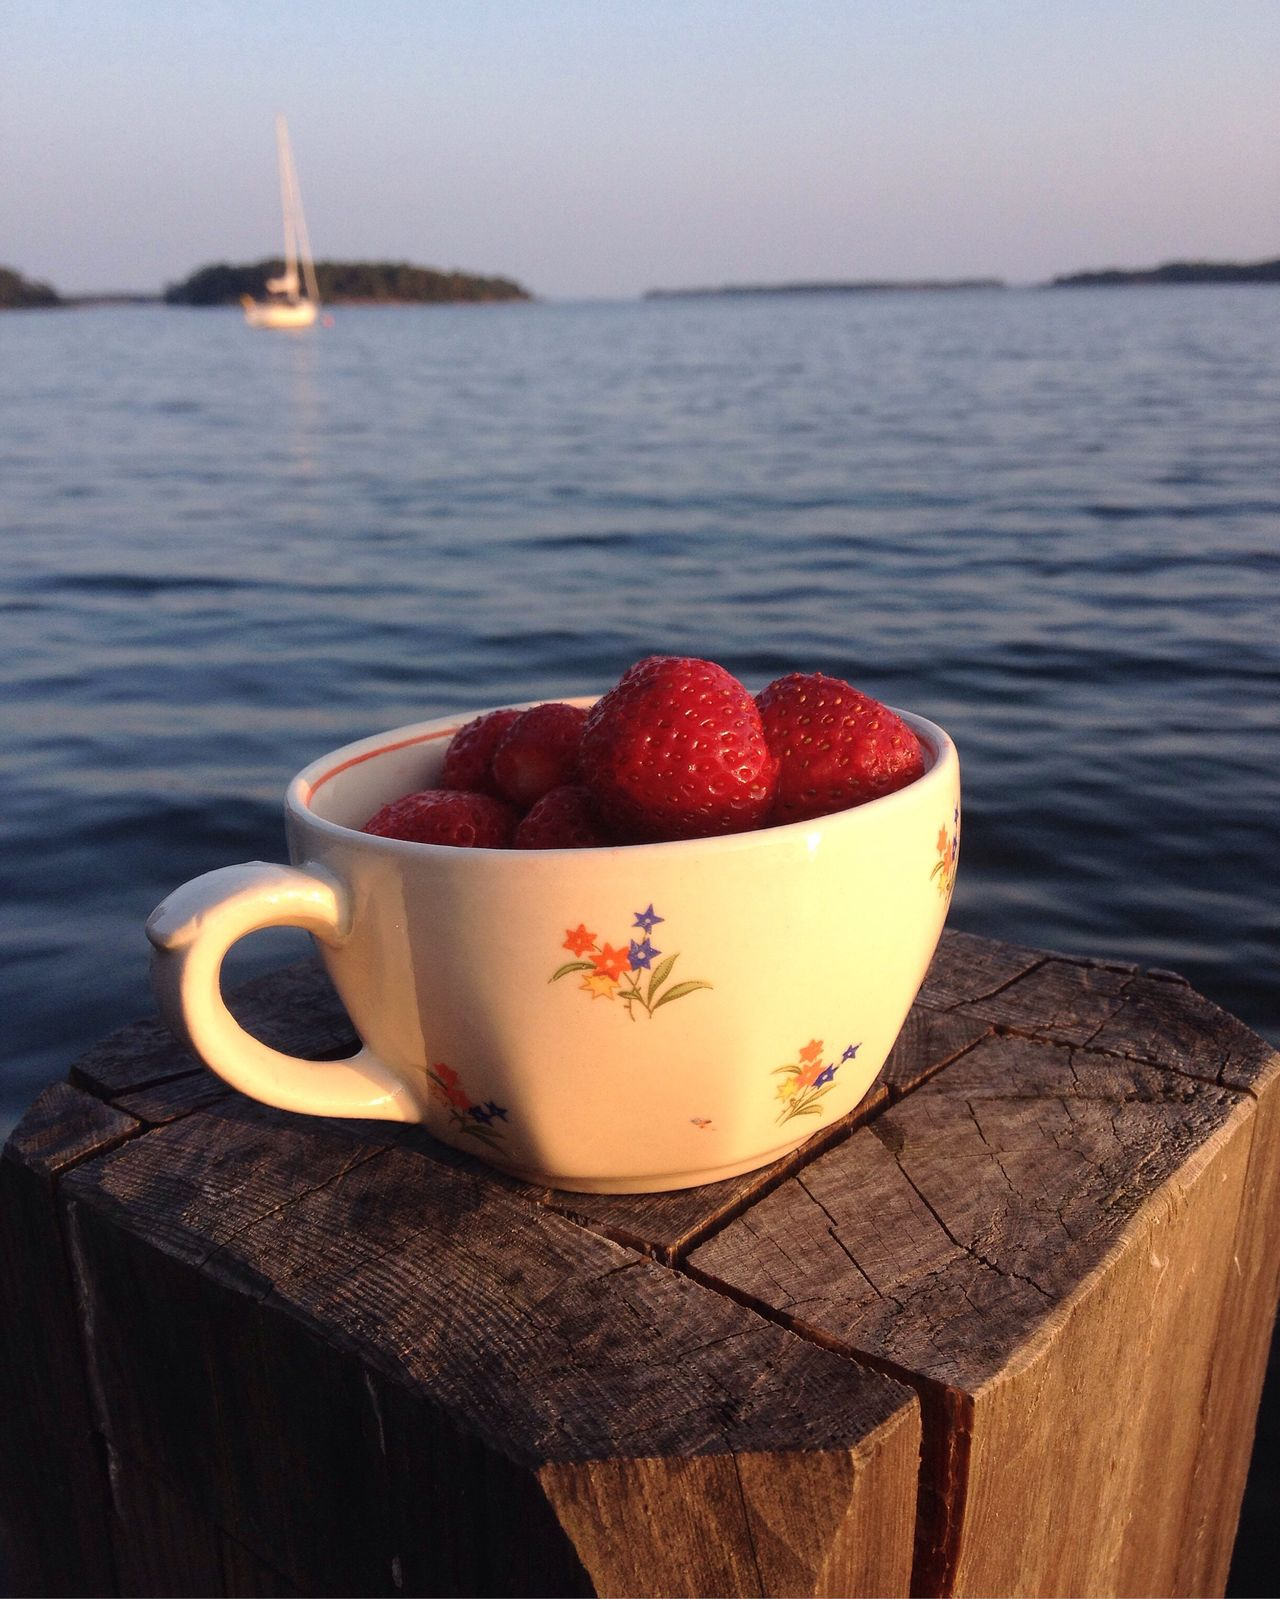 Strawberries Finnish Archipelago Finnish Summer Sea And Sky Sailing Boat Finland White Night Hot Summer Night